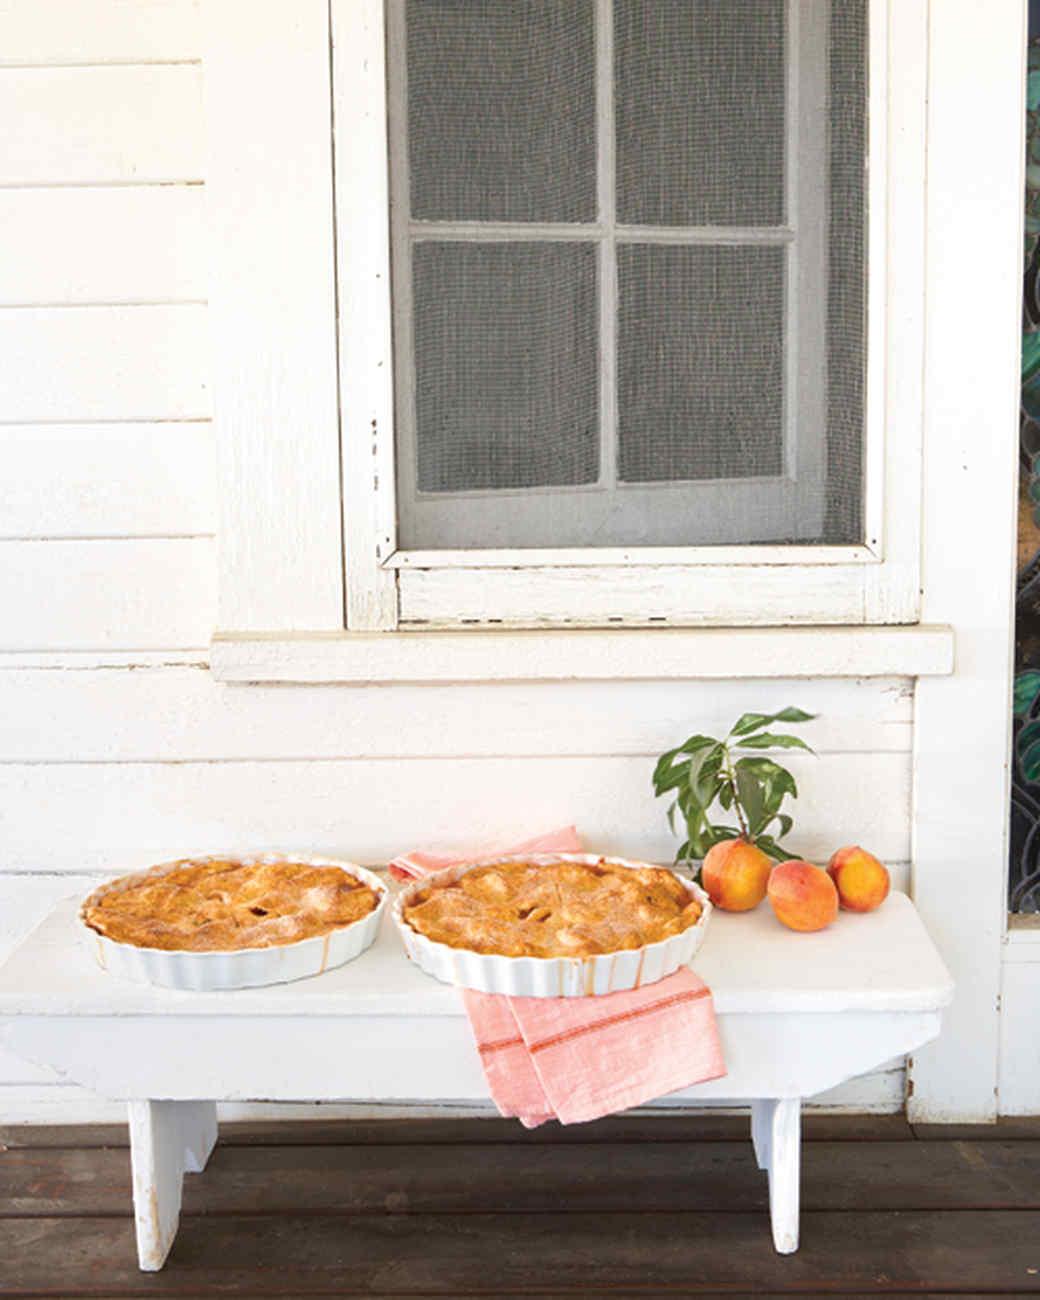 Cornmeal Crust for Peach Potpie